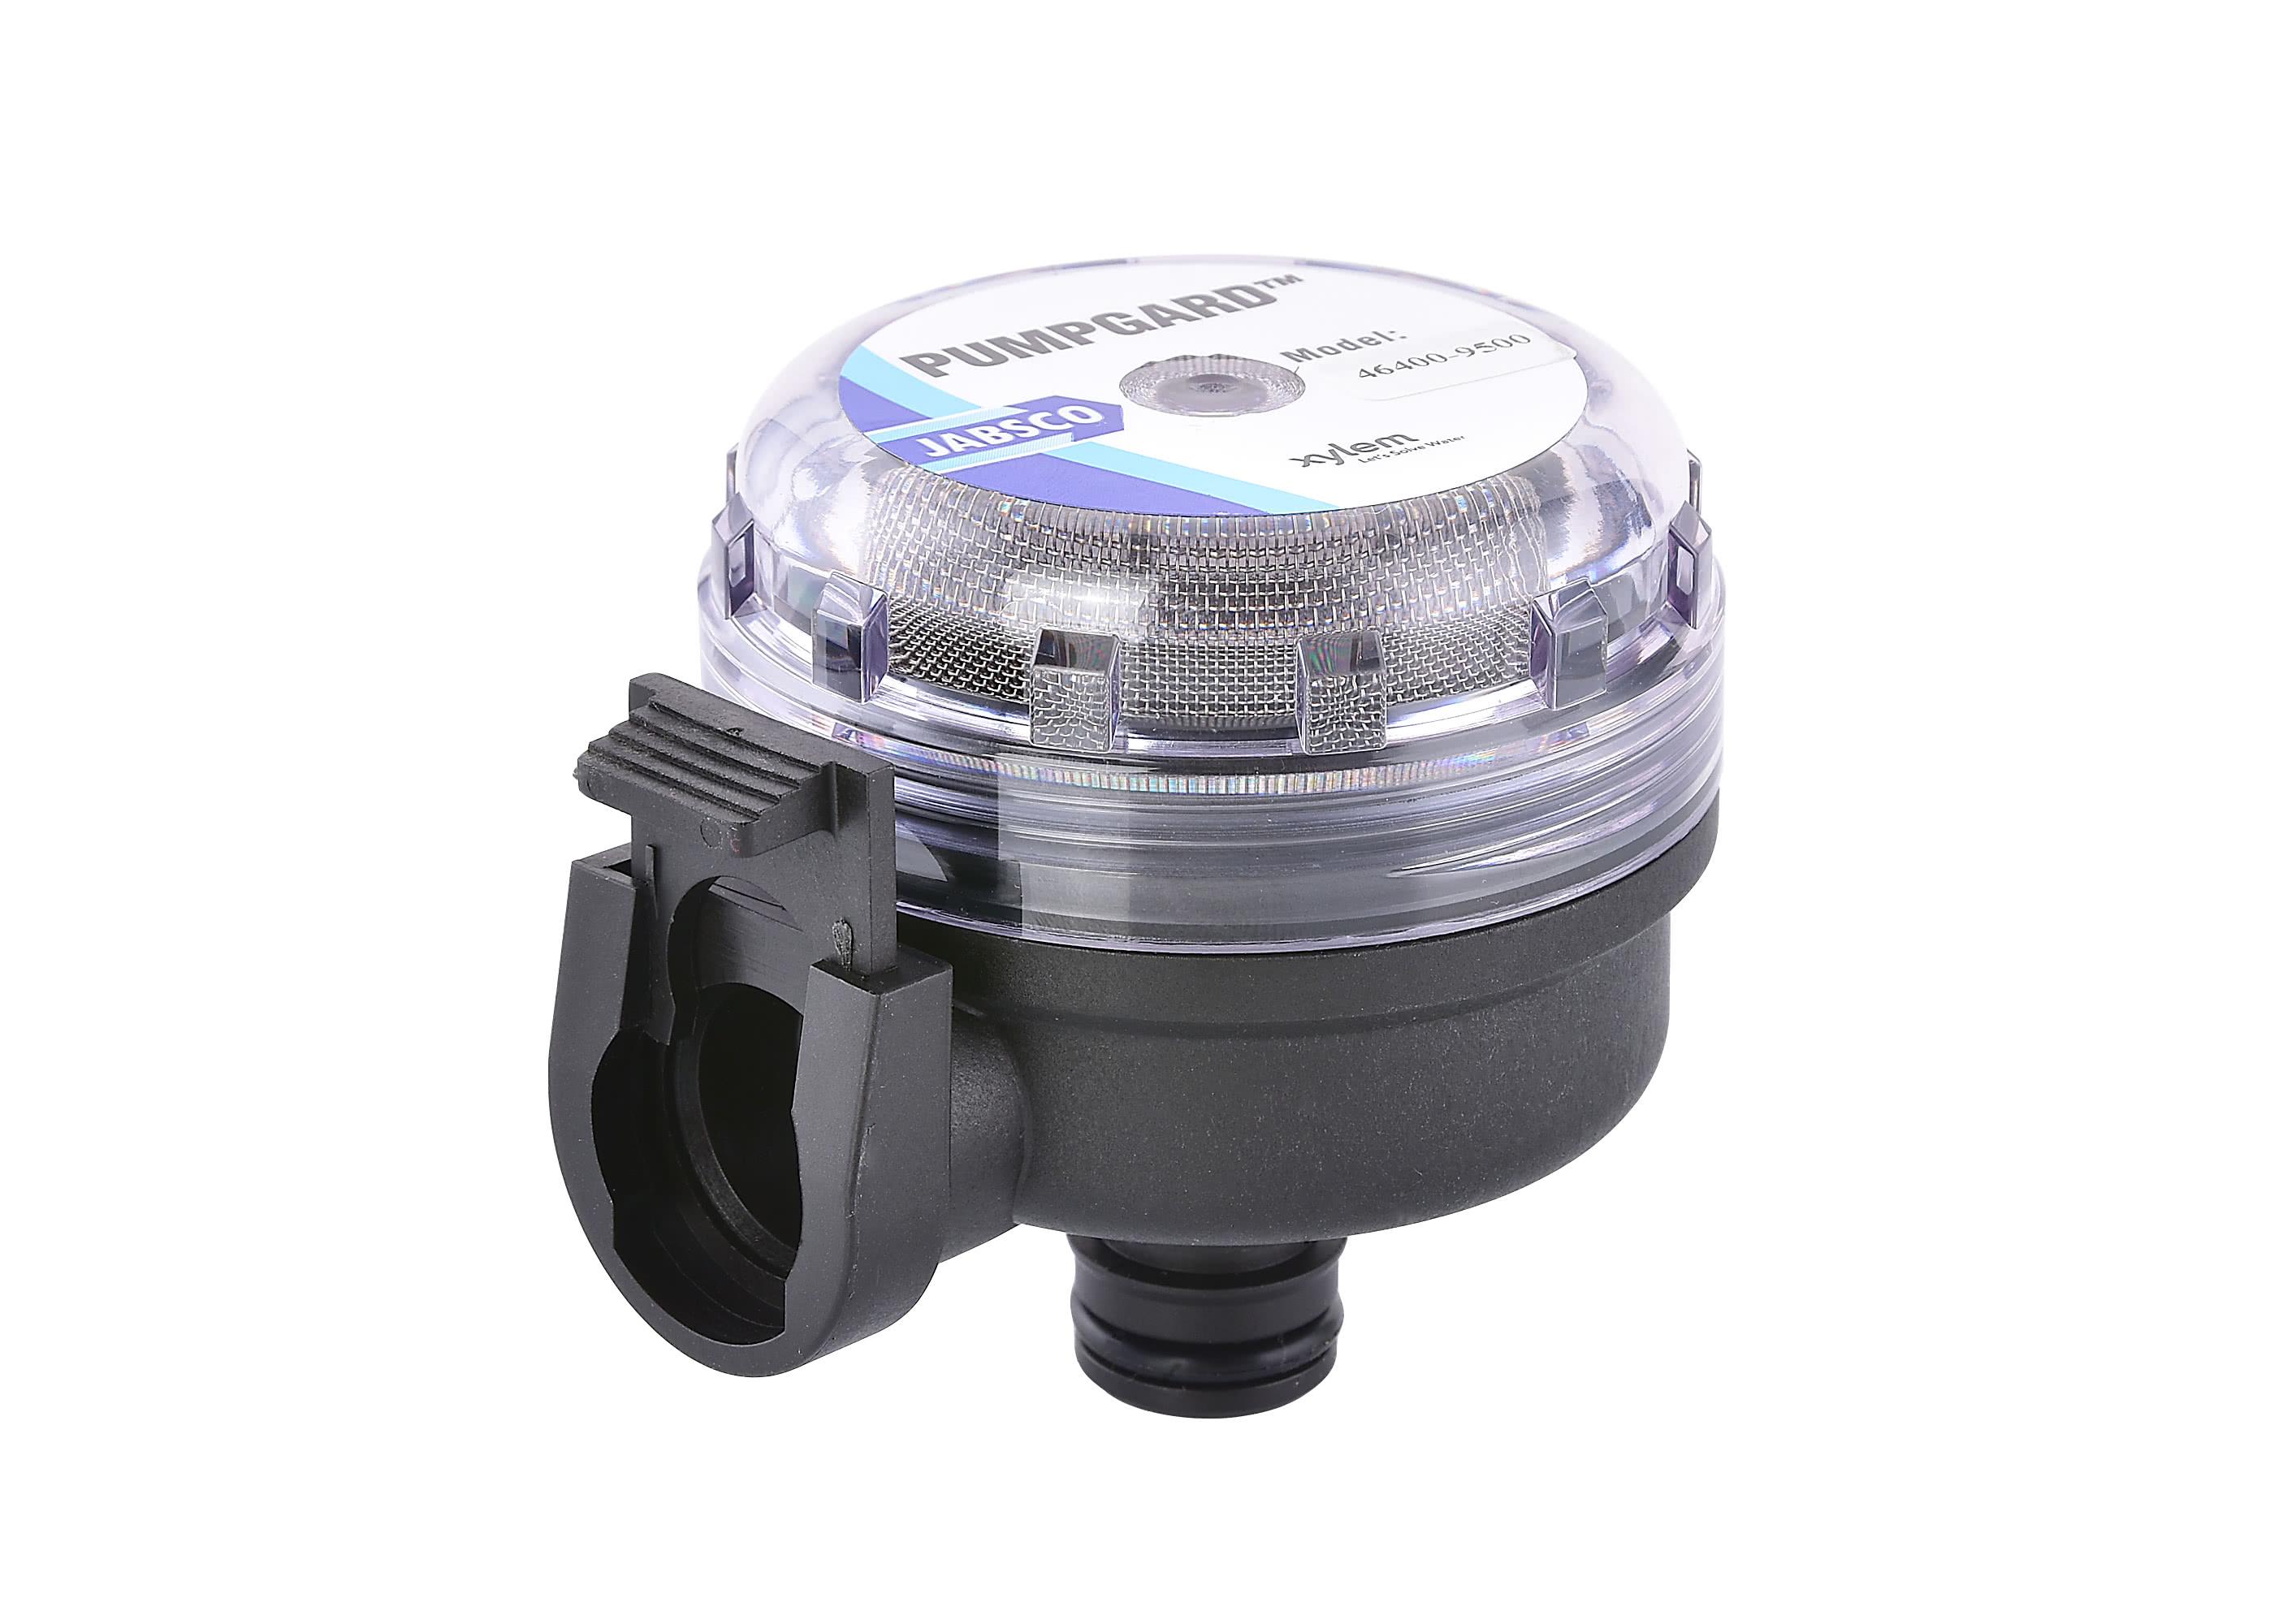 24985_JABSCO-Wasserfilter-WC-1.jpg